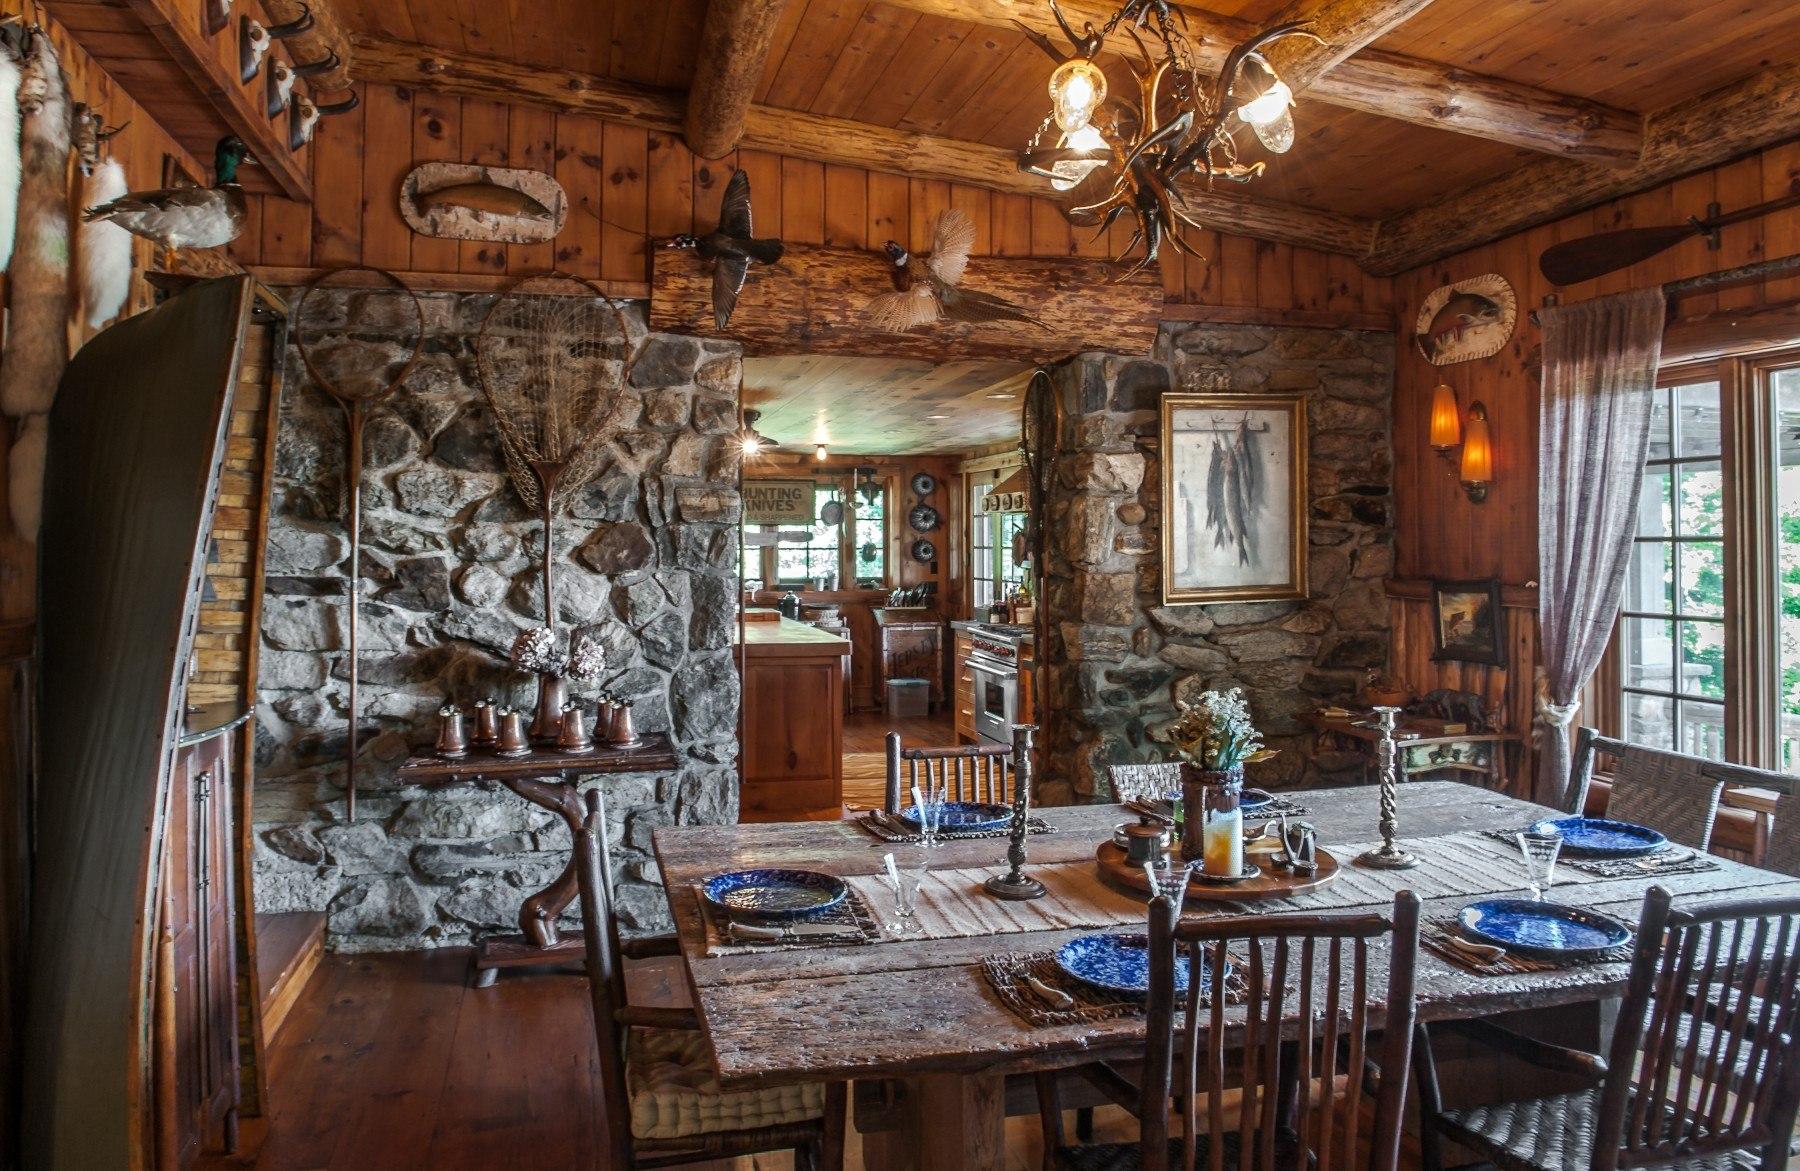 mountaindale upstate renovation design vacation cabins interior rent new cabin catskills glen wrk rental york wilde interiors community ny bungalow ideas